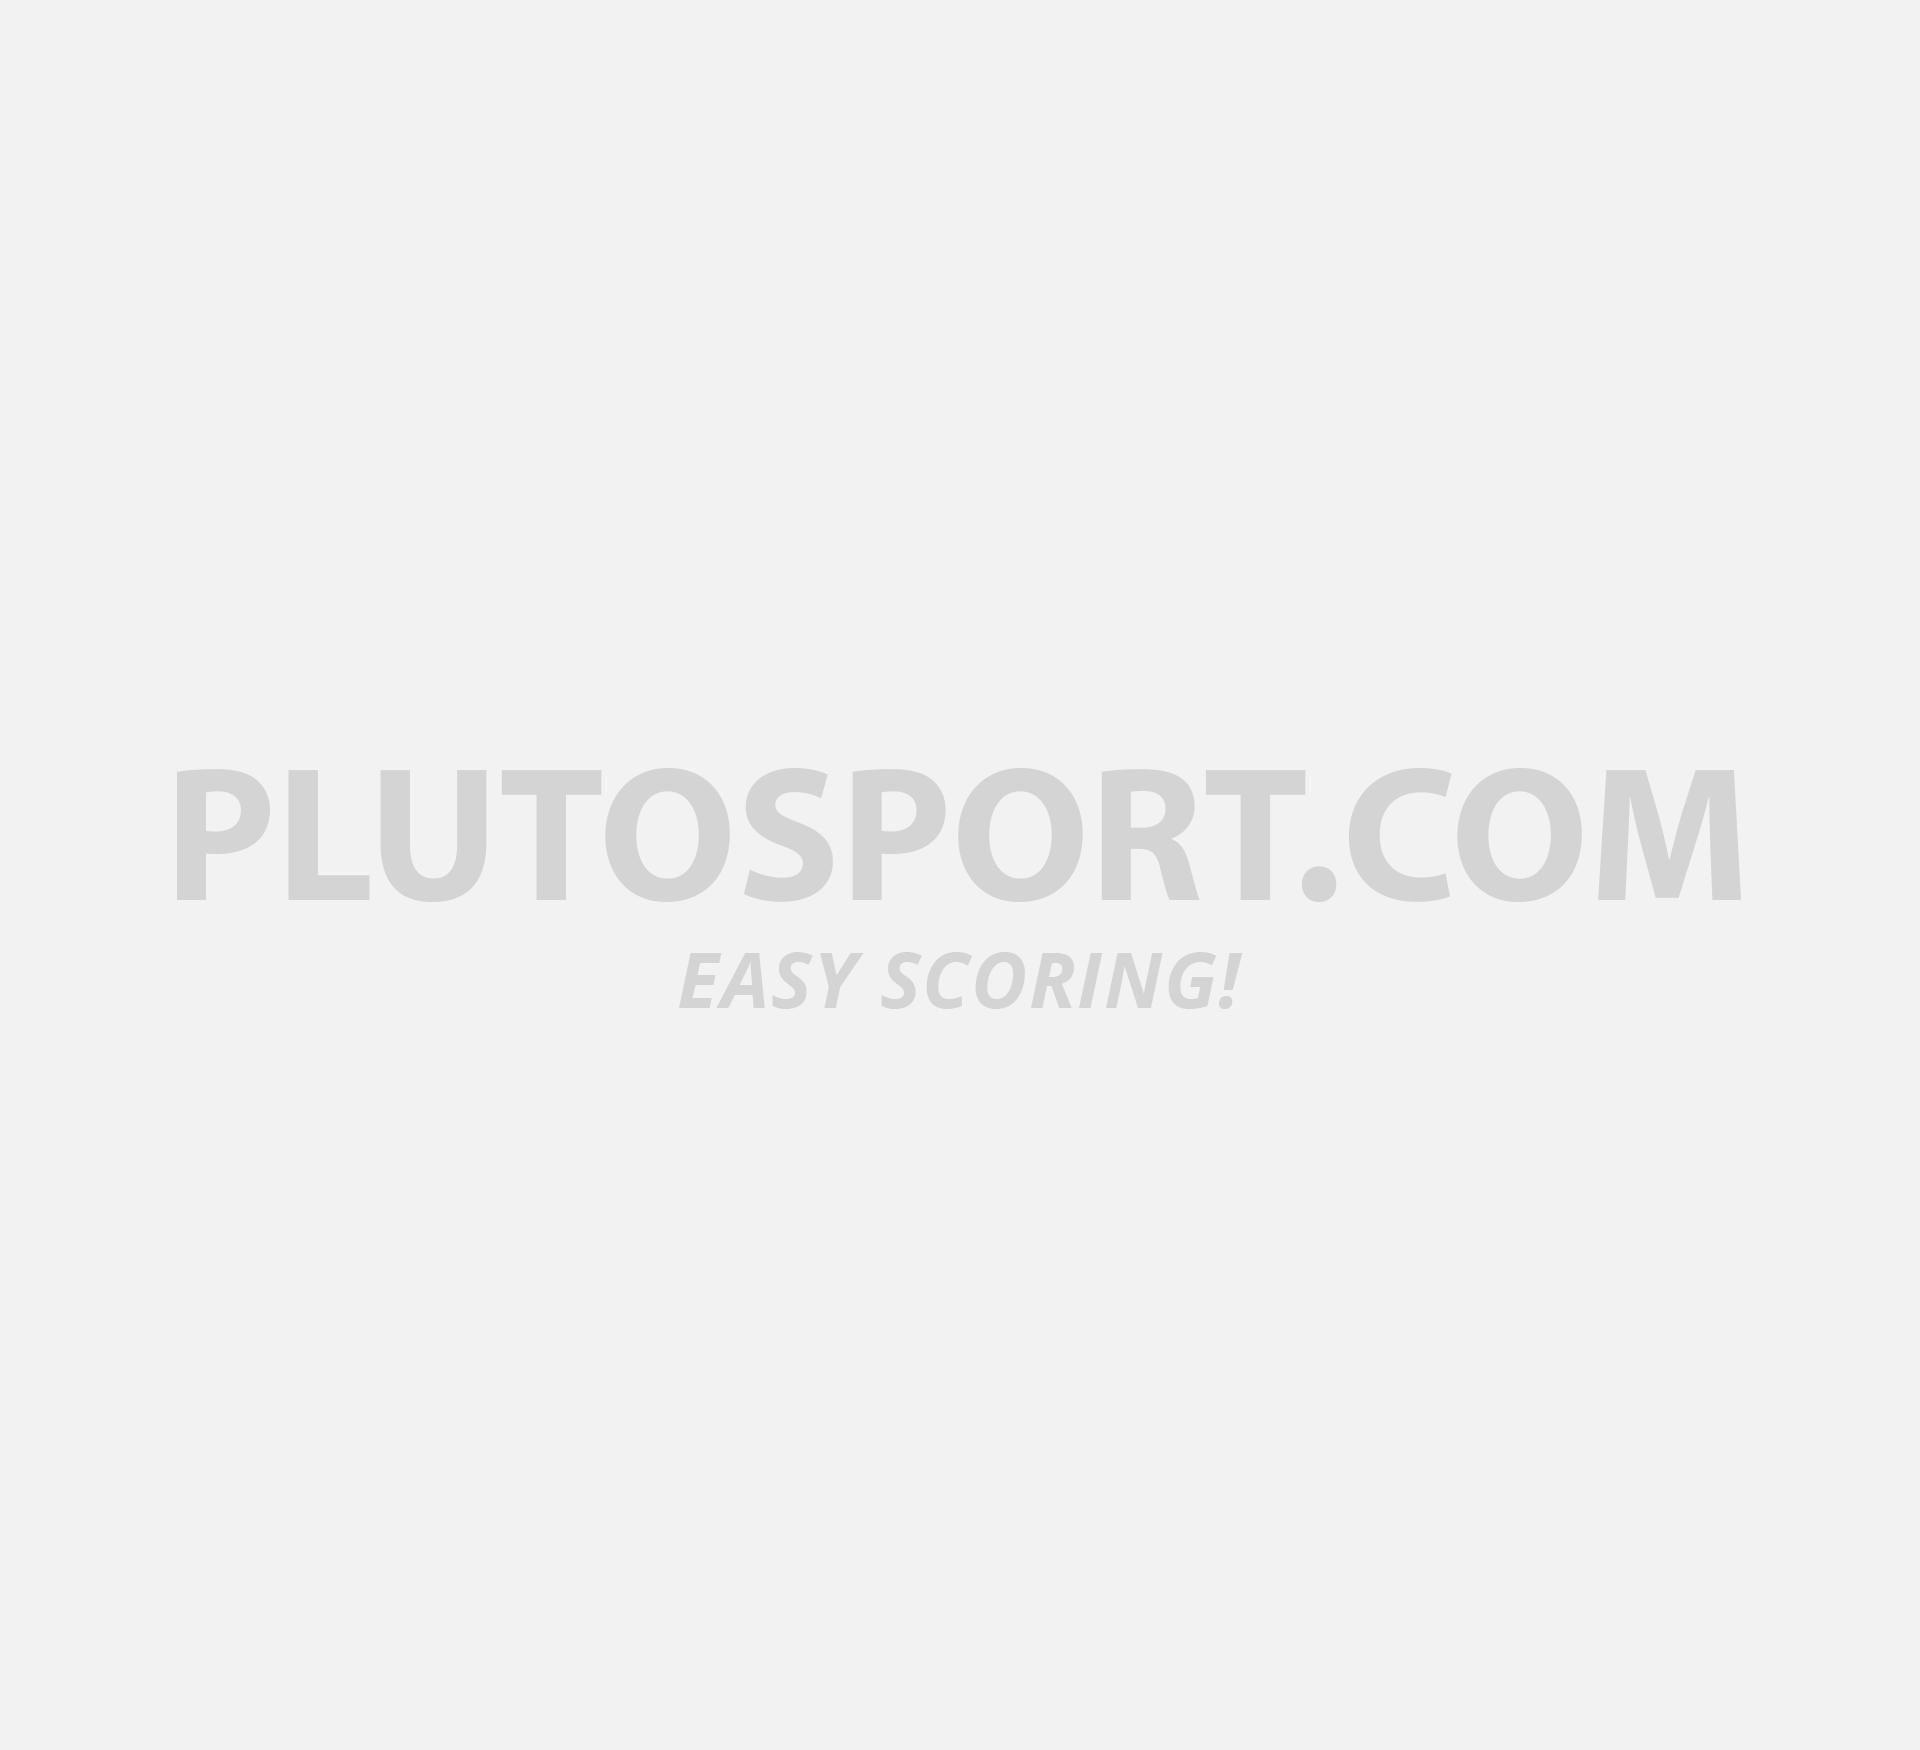 Phil Taylor/ /Soft Tip/ /Power 9/F/ünf G3/ /18/g/ /Generation 3/ /mit Gratis Darts Ecke Checkout-Karte